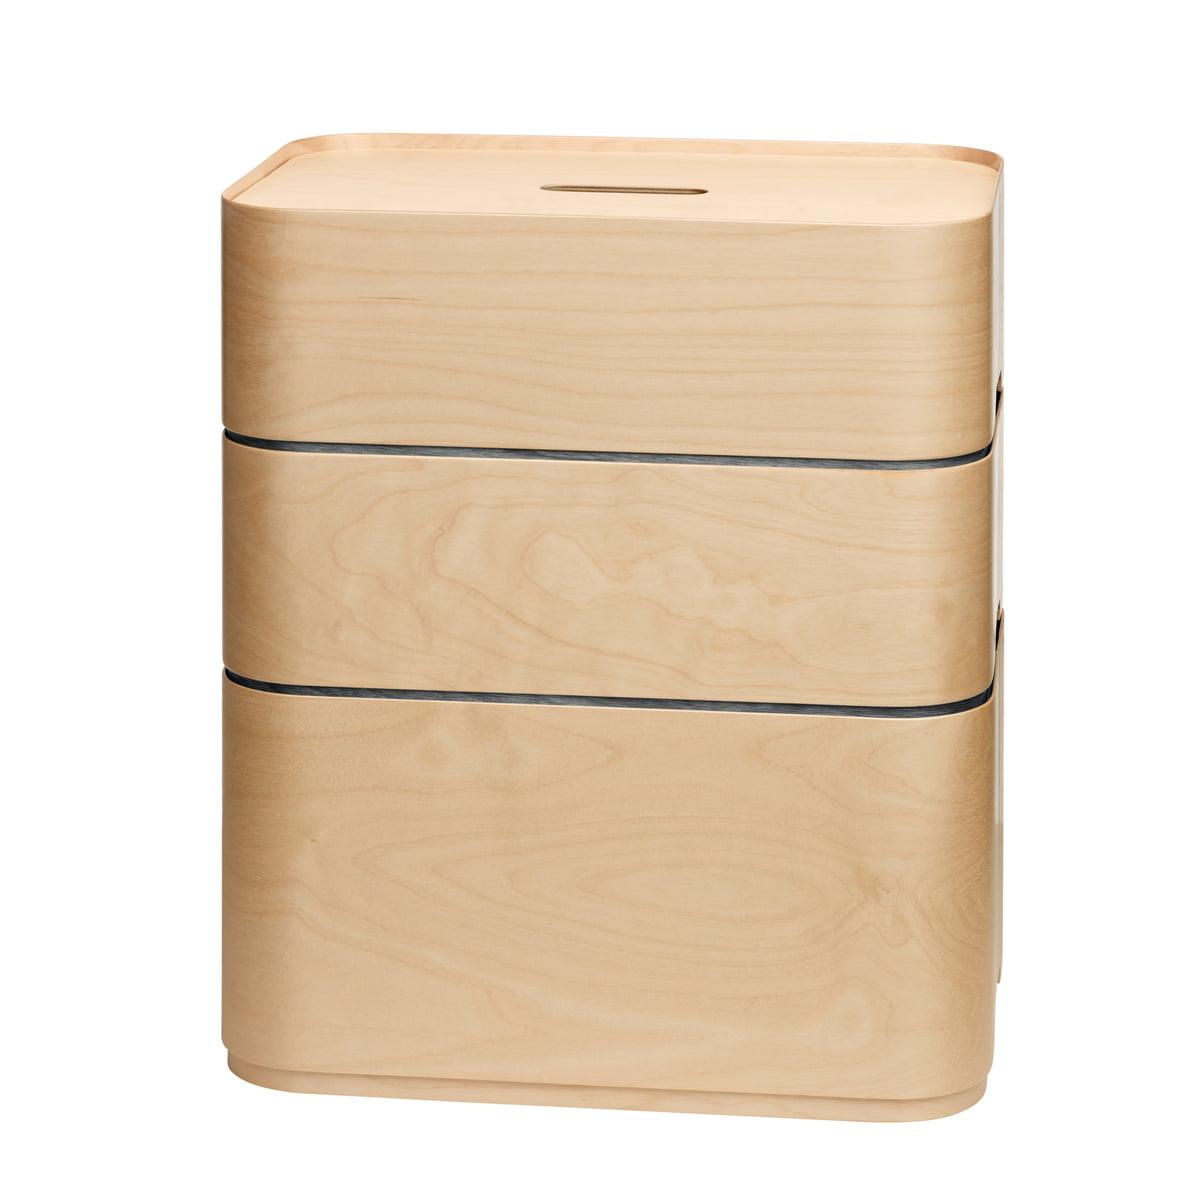 iittala vakka aufbewahrungsbox im shop. Black Bedroom Furniture Sets. Home Design Ideas